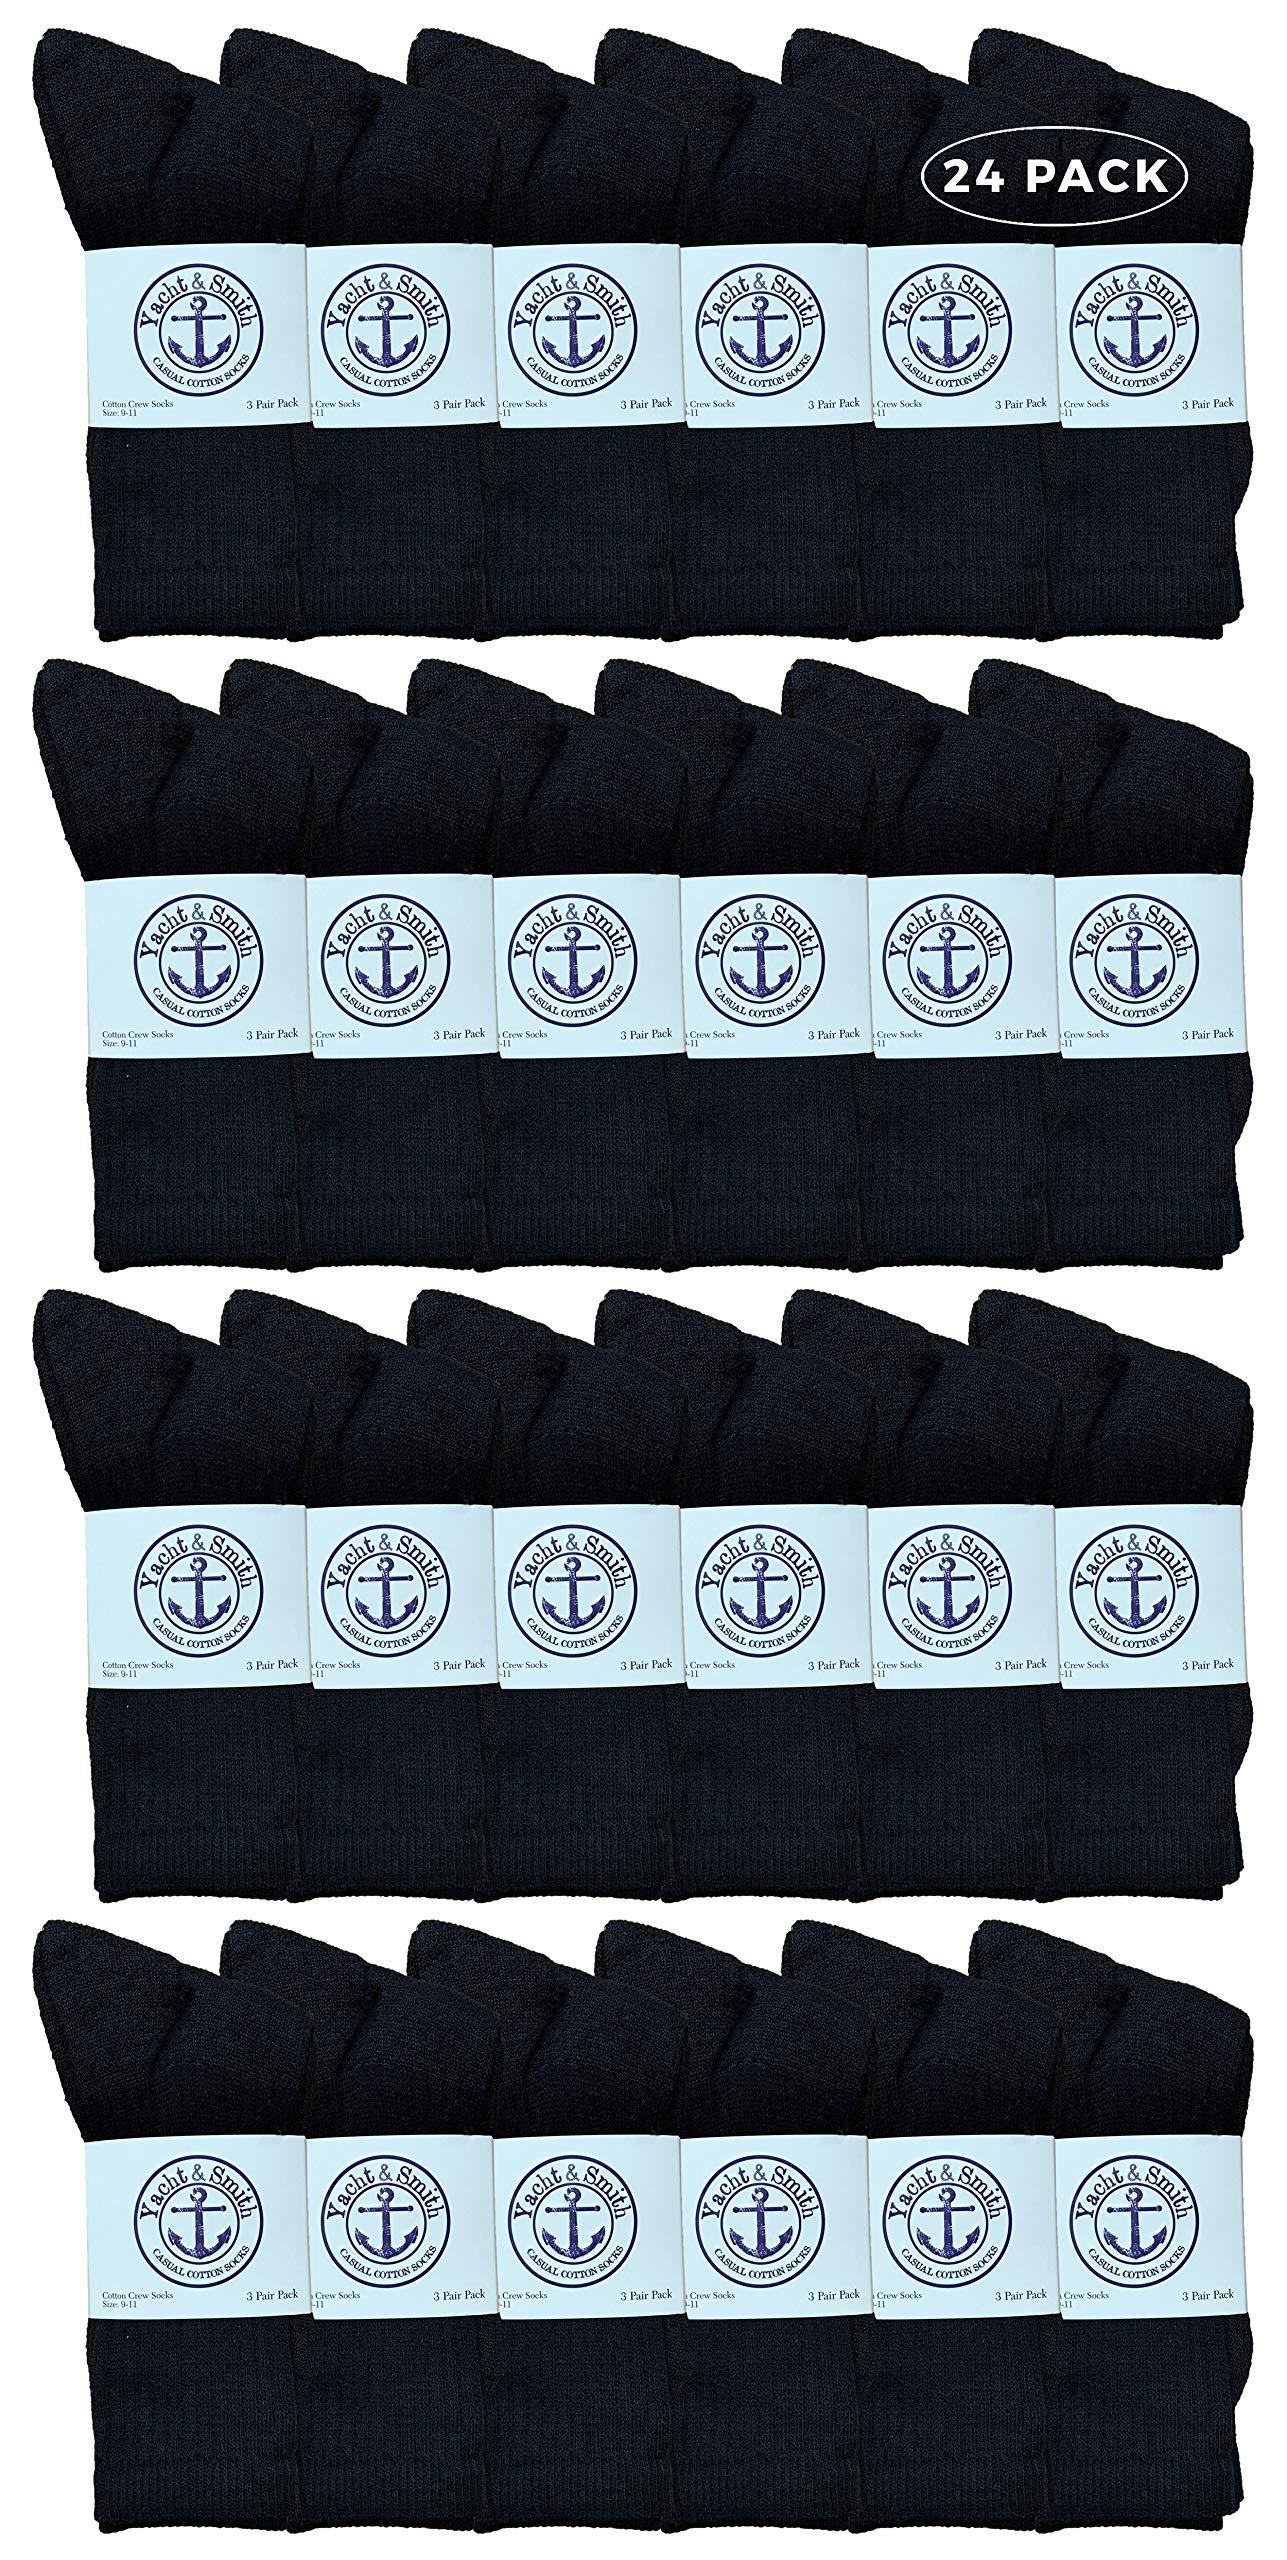 Yacht & Smith Wholesale Bulk Womens Crew Socks, Cotton Sport Athletic Socks - Size 9-22 by Yacht & Smith